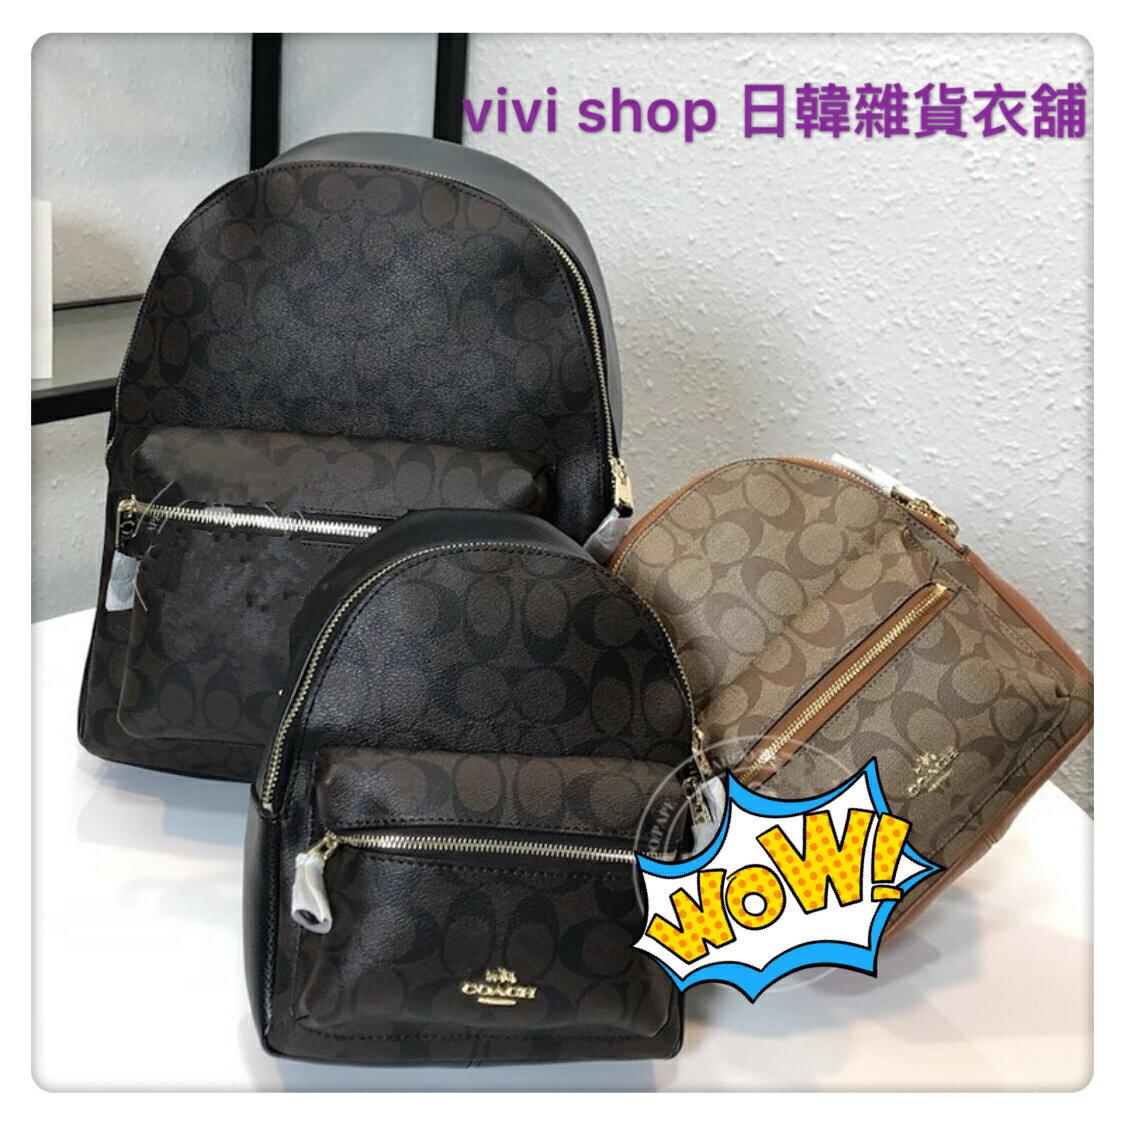 *vivi shop*美國COACH F38301大號、F32200(中號款)、38302、(25909徽章款)小號.Outlet正品代購-PVC配牛皮 男.女 雙肩後背包 限量特惠- (附代購憑證)